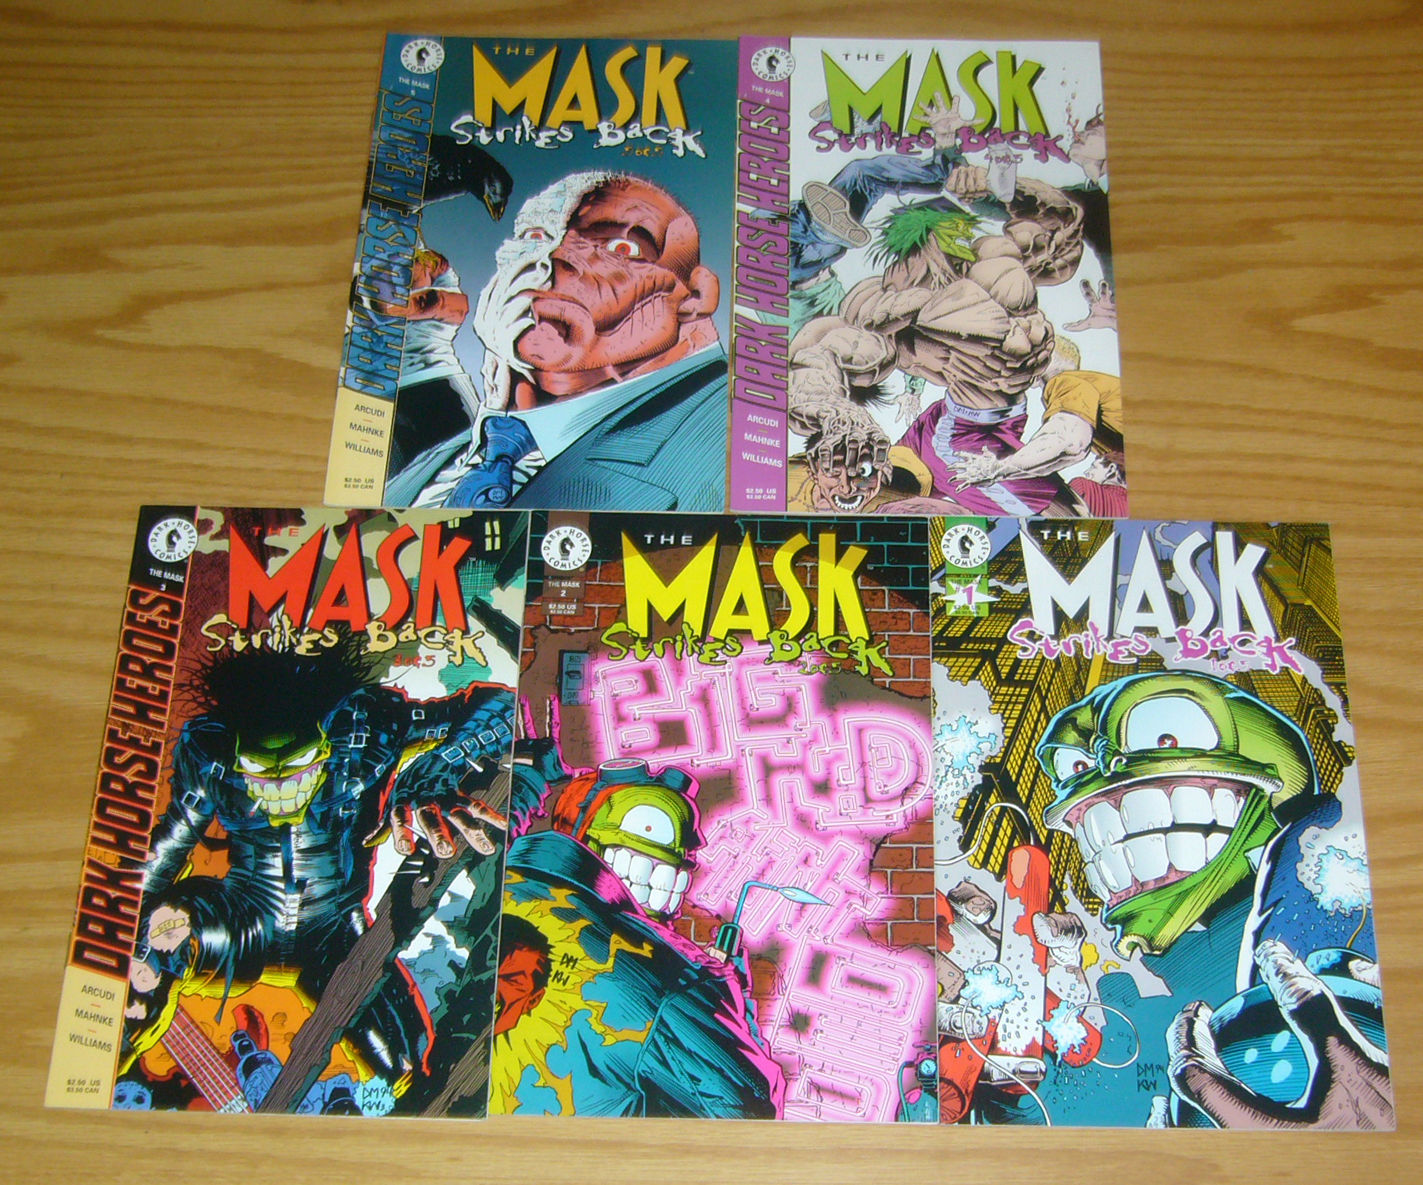 1995 John Arcudi /& Doug Mahnke The Mask strikes back No.3